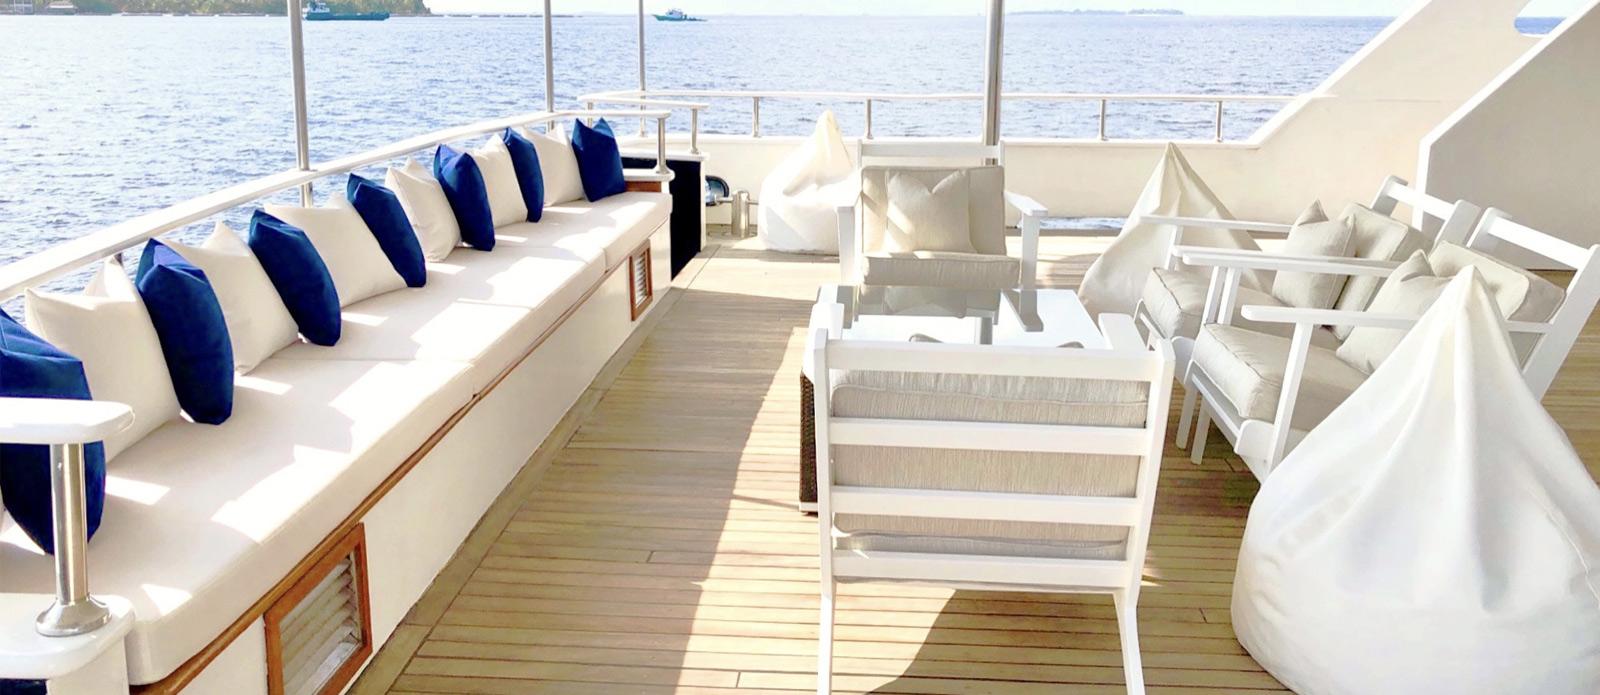 Safira-Luxury-Yacht-For-Sale-Interior-12